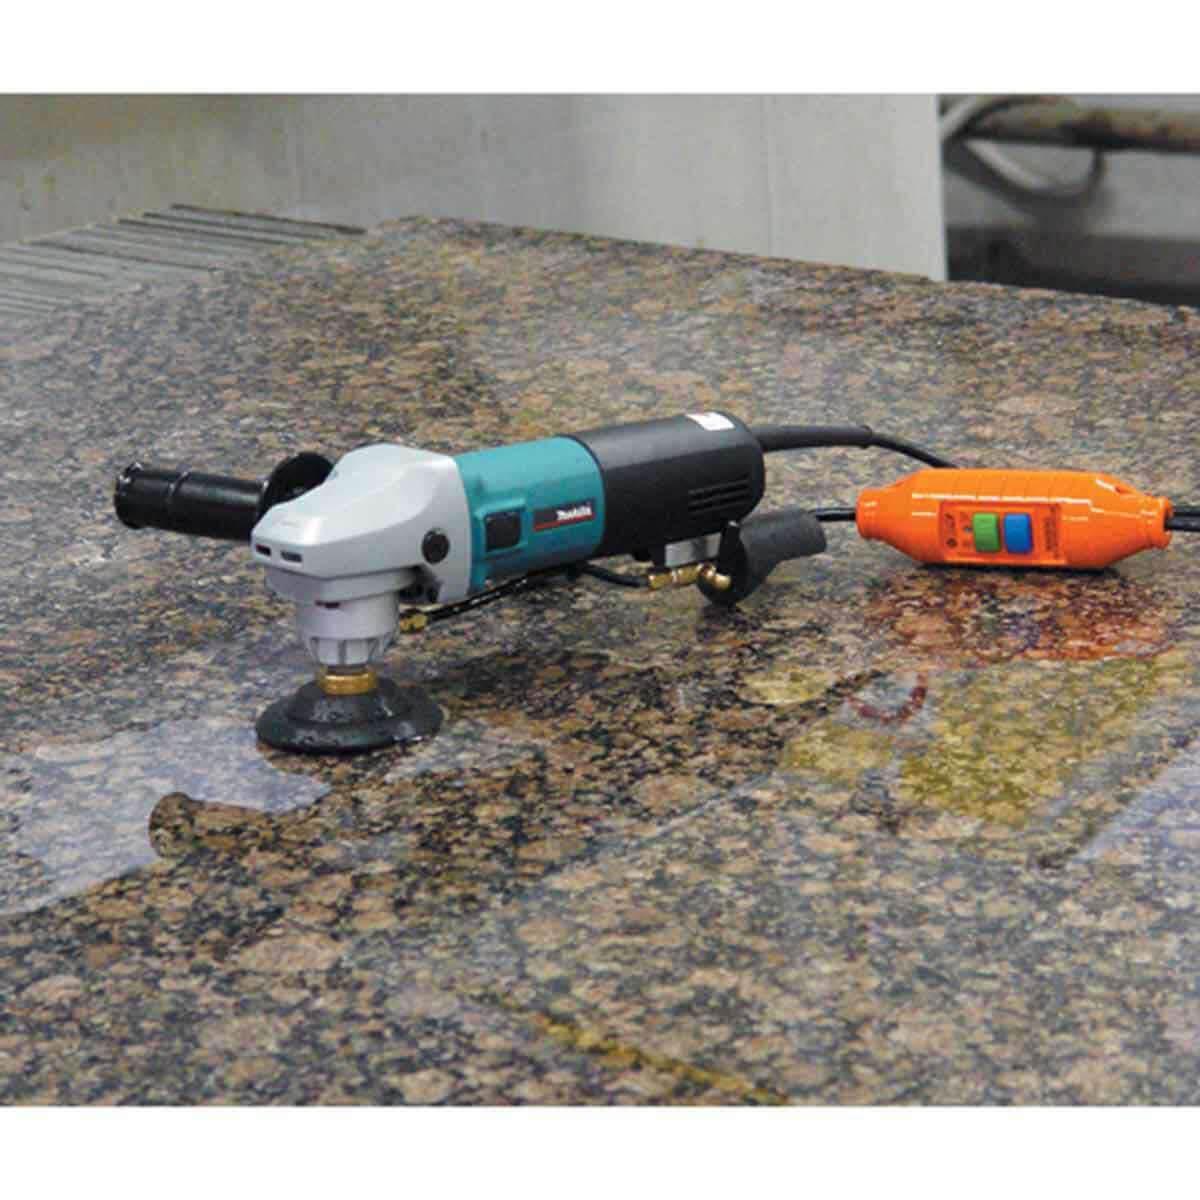 Makita Variable Speed Polisher Kit